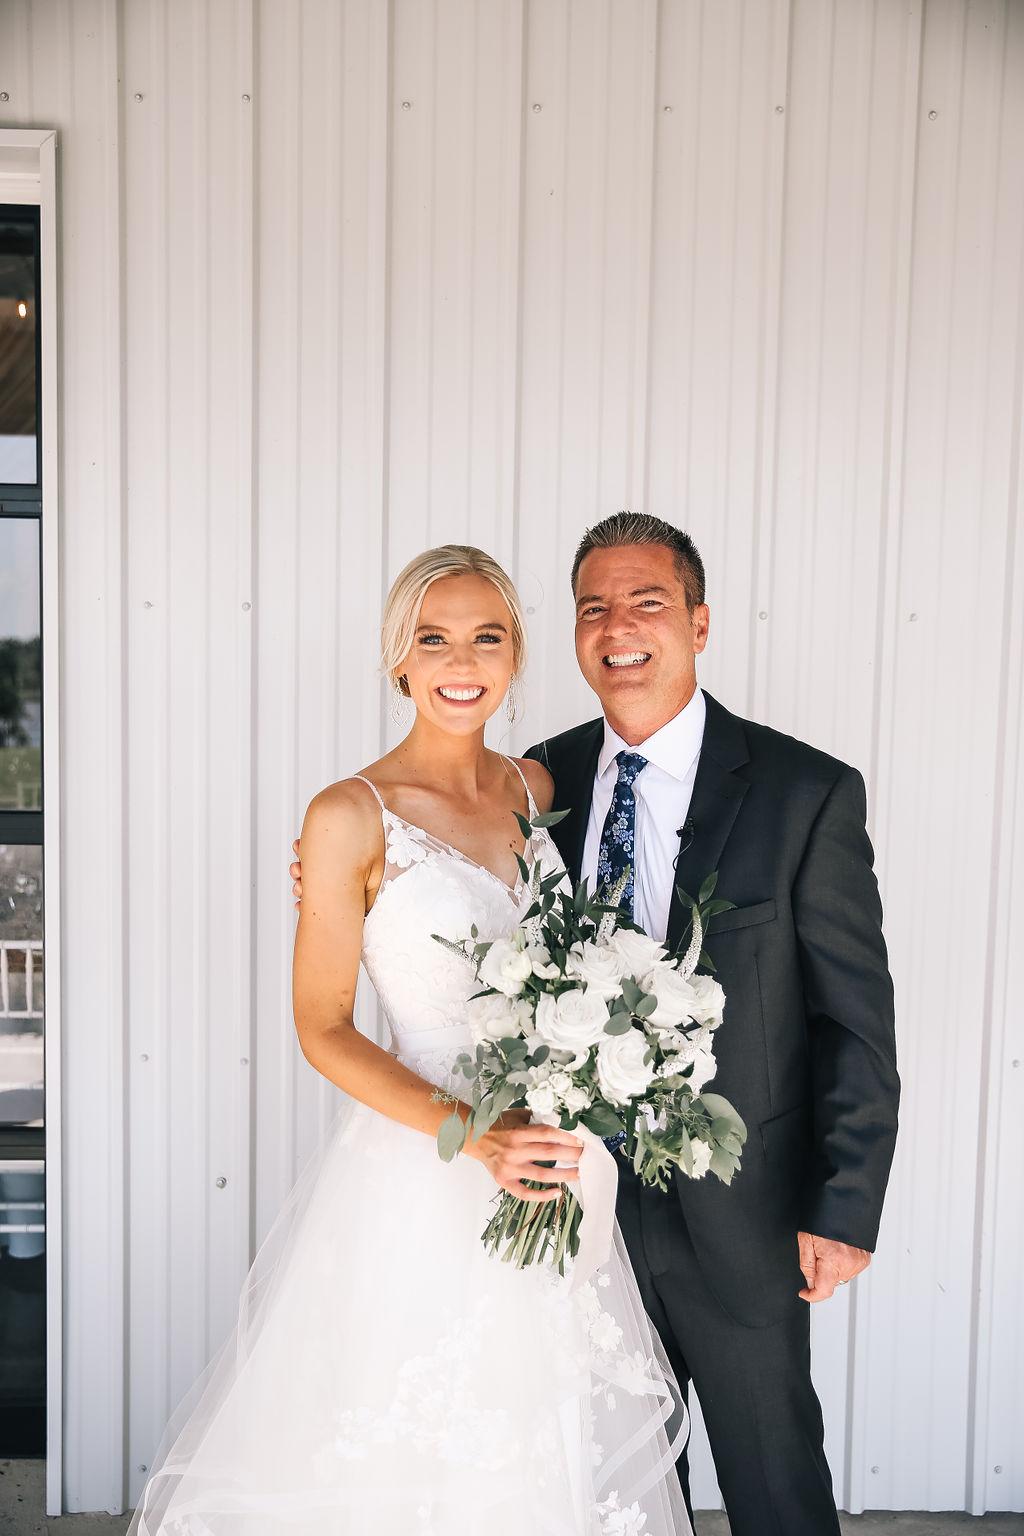 Tulsa Wedding Venues 27.JPG